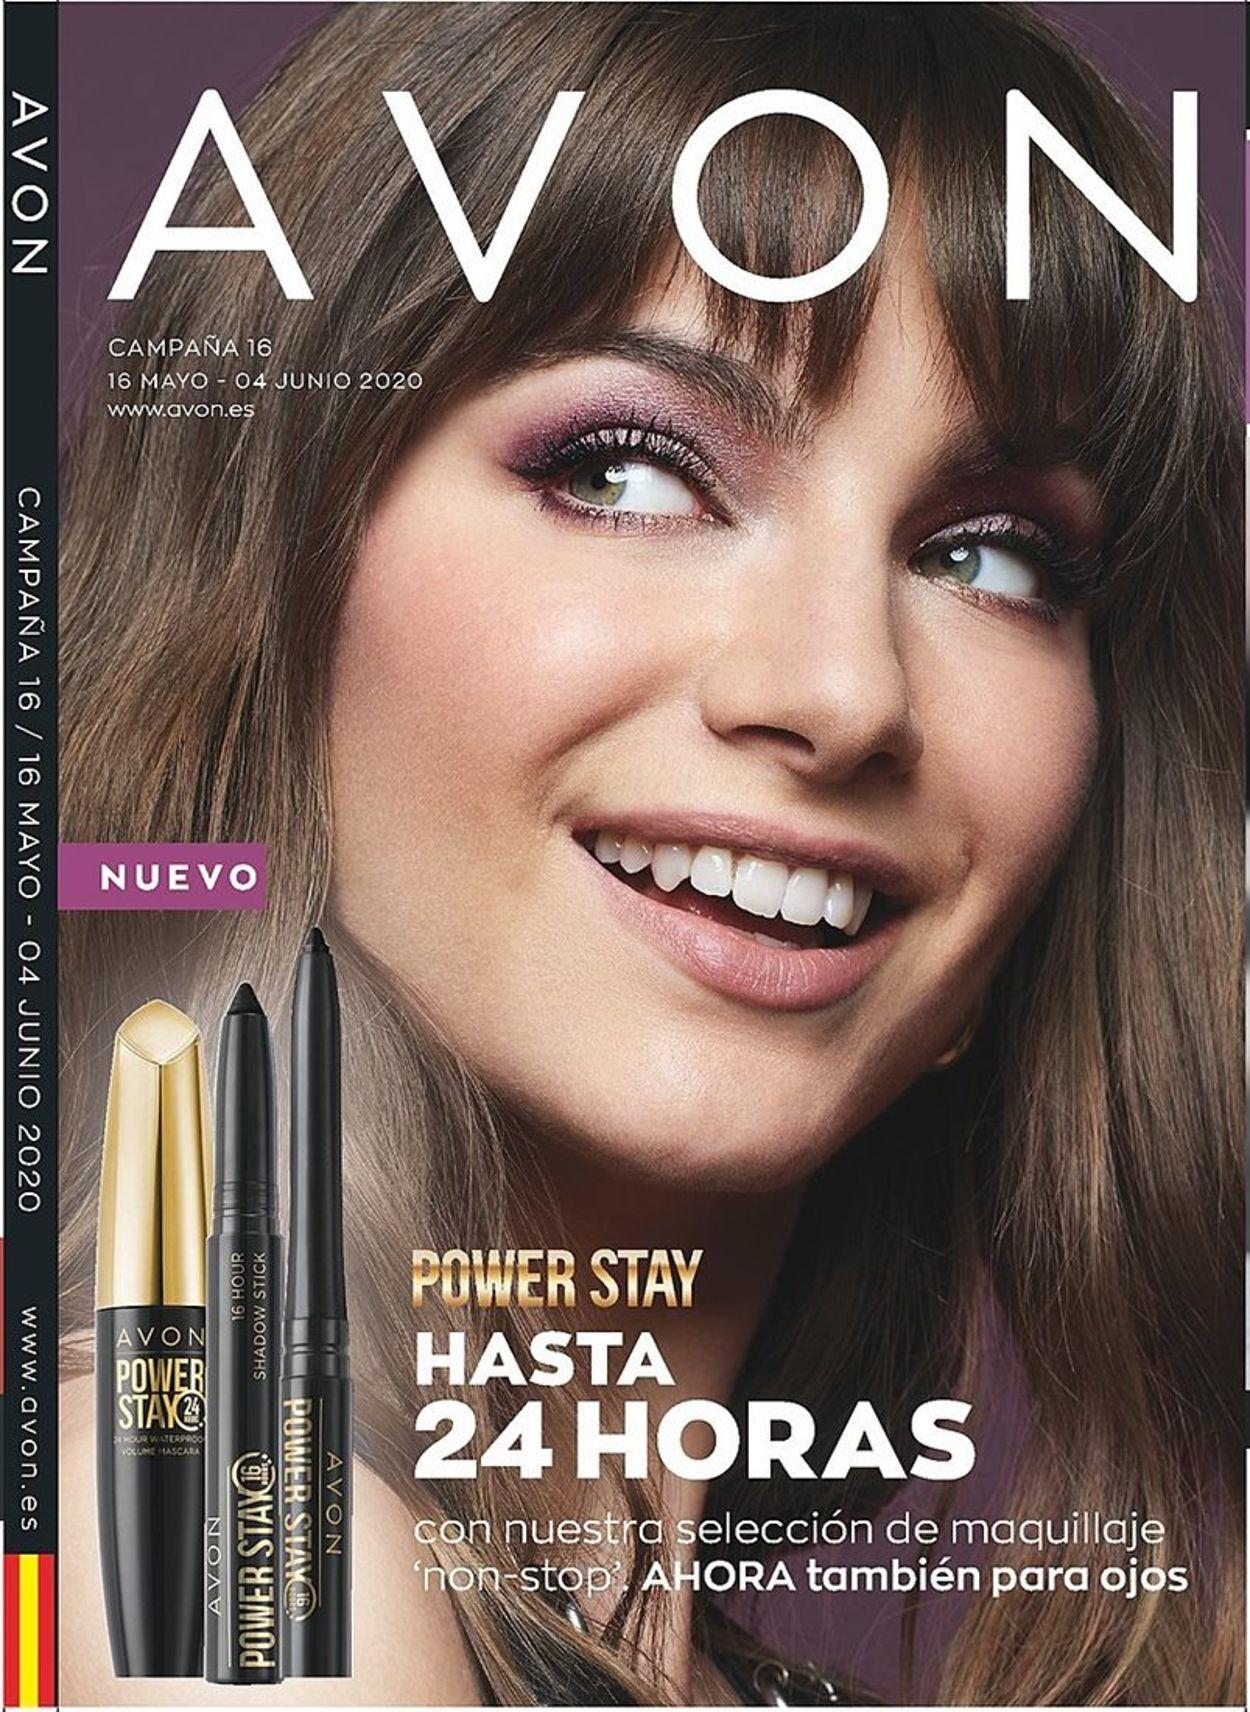 Avon Folleto - 16.05-04.06.2020